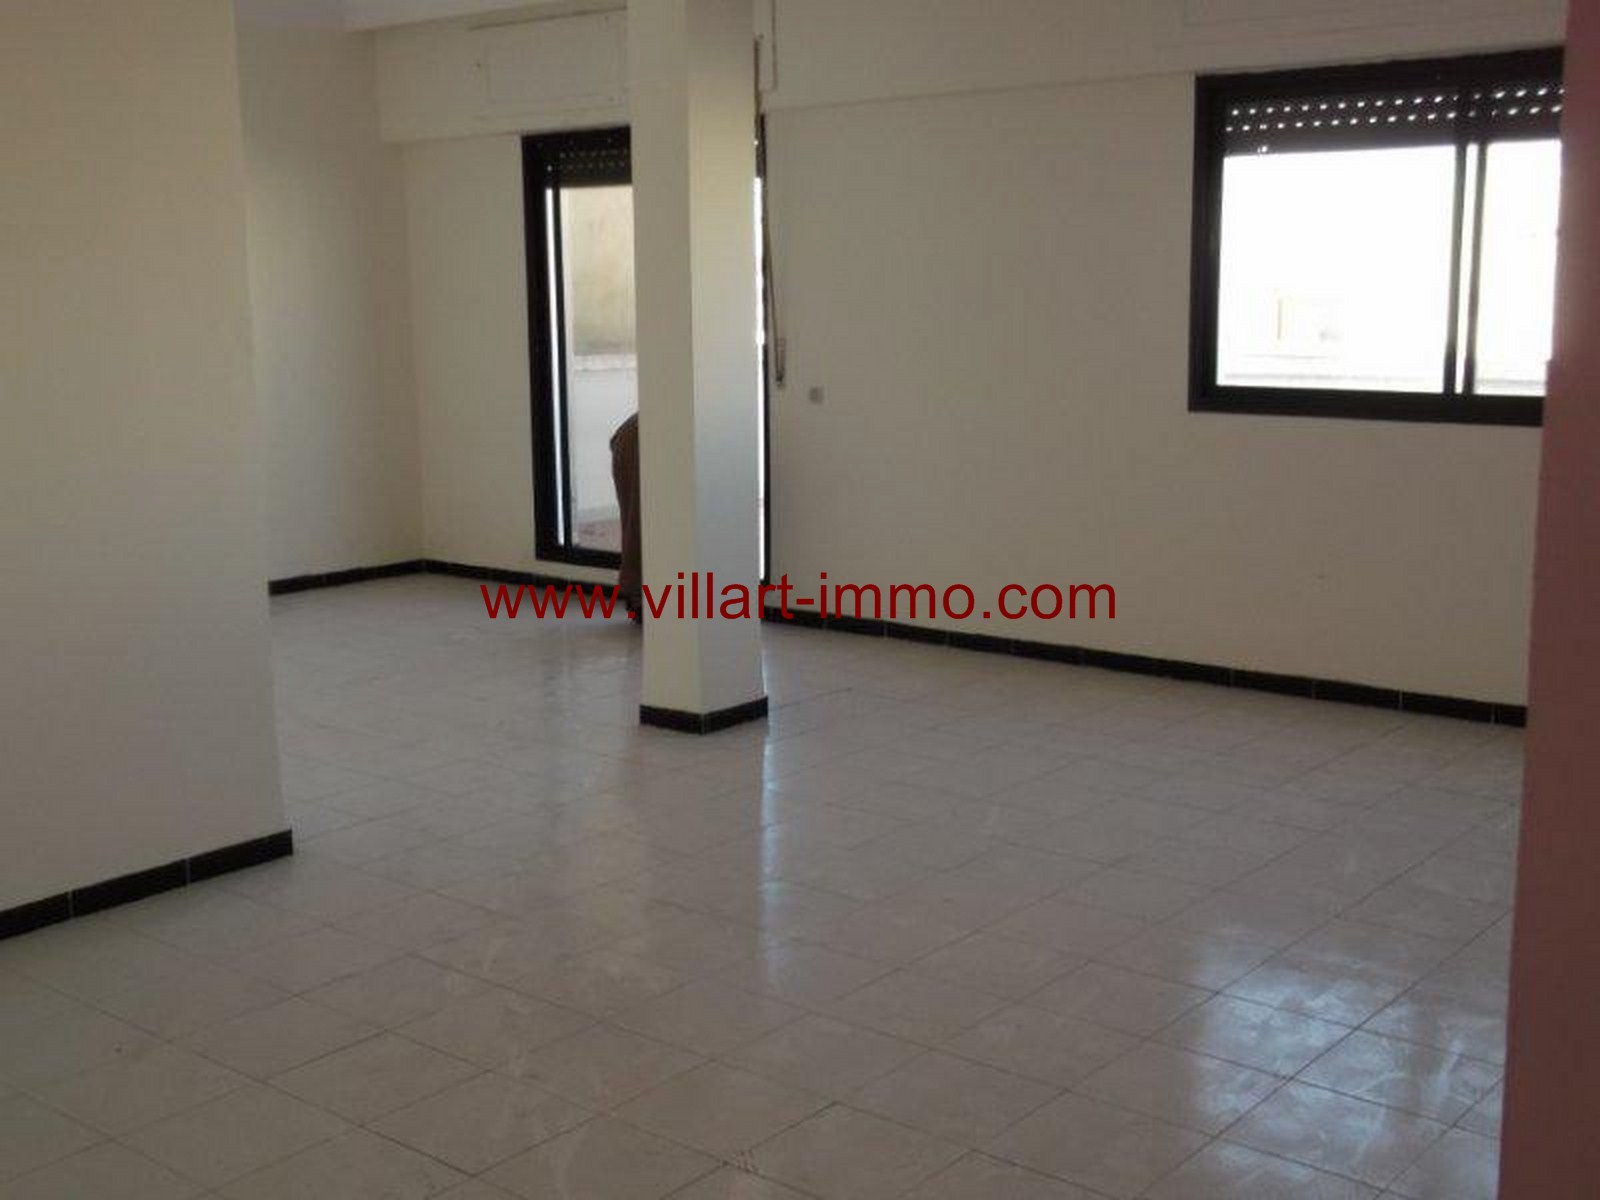 3- Vente -appartement-Tanger-Maroc–Centre-De-Ville-Salon 1 -VA91-Villartimmo